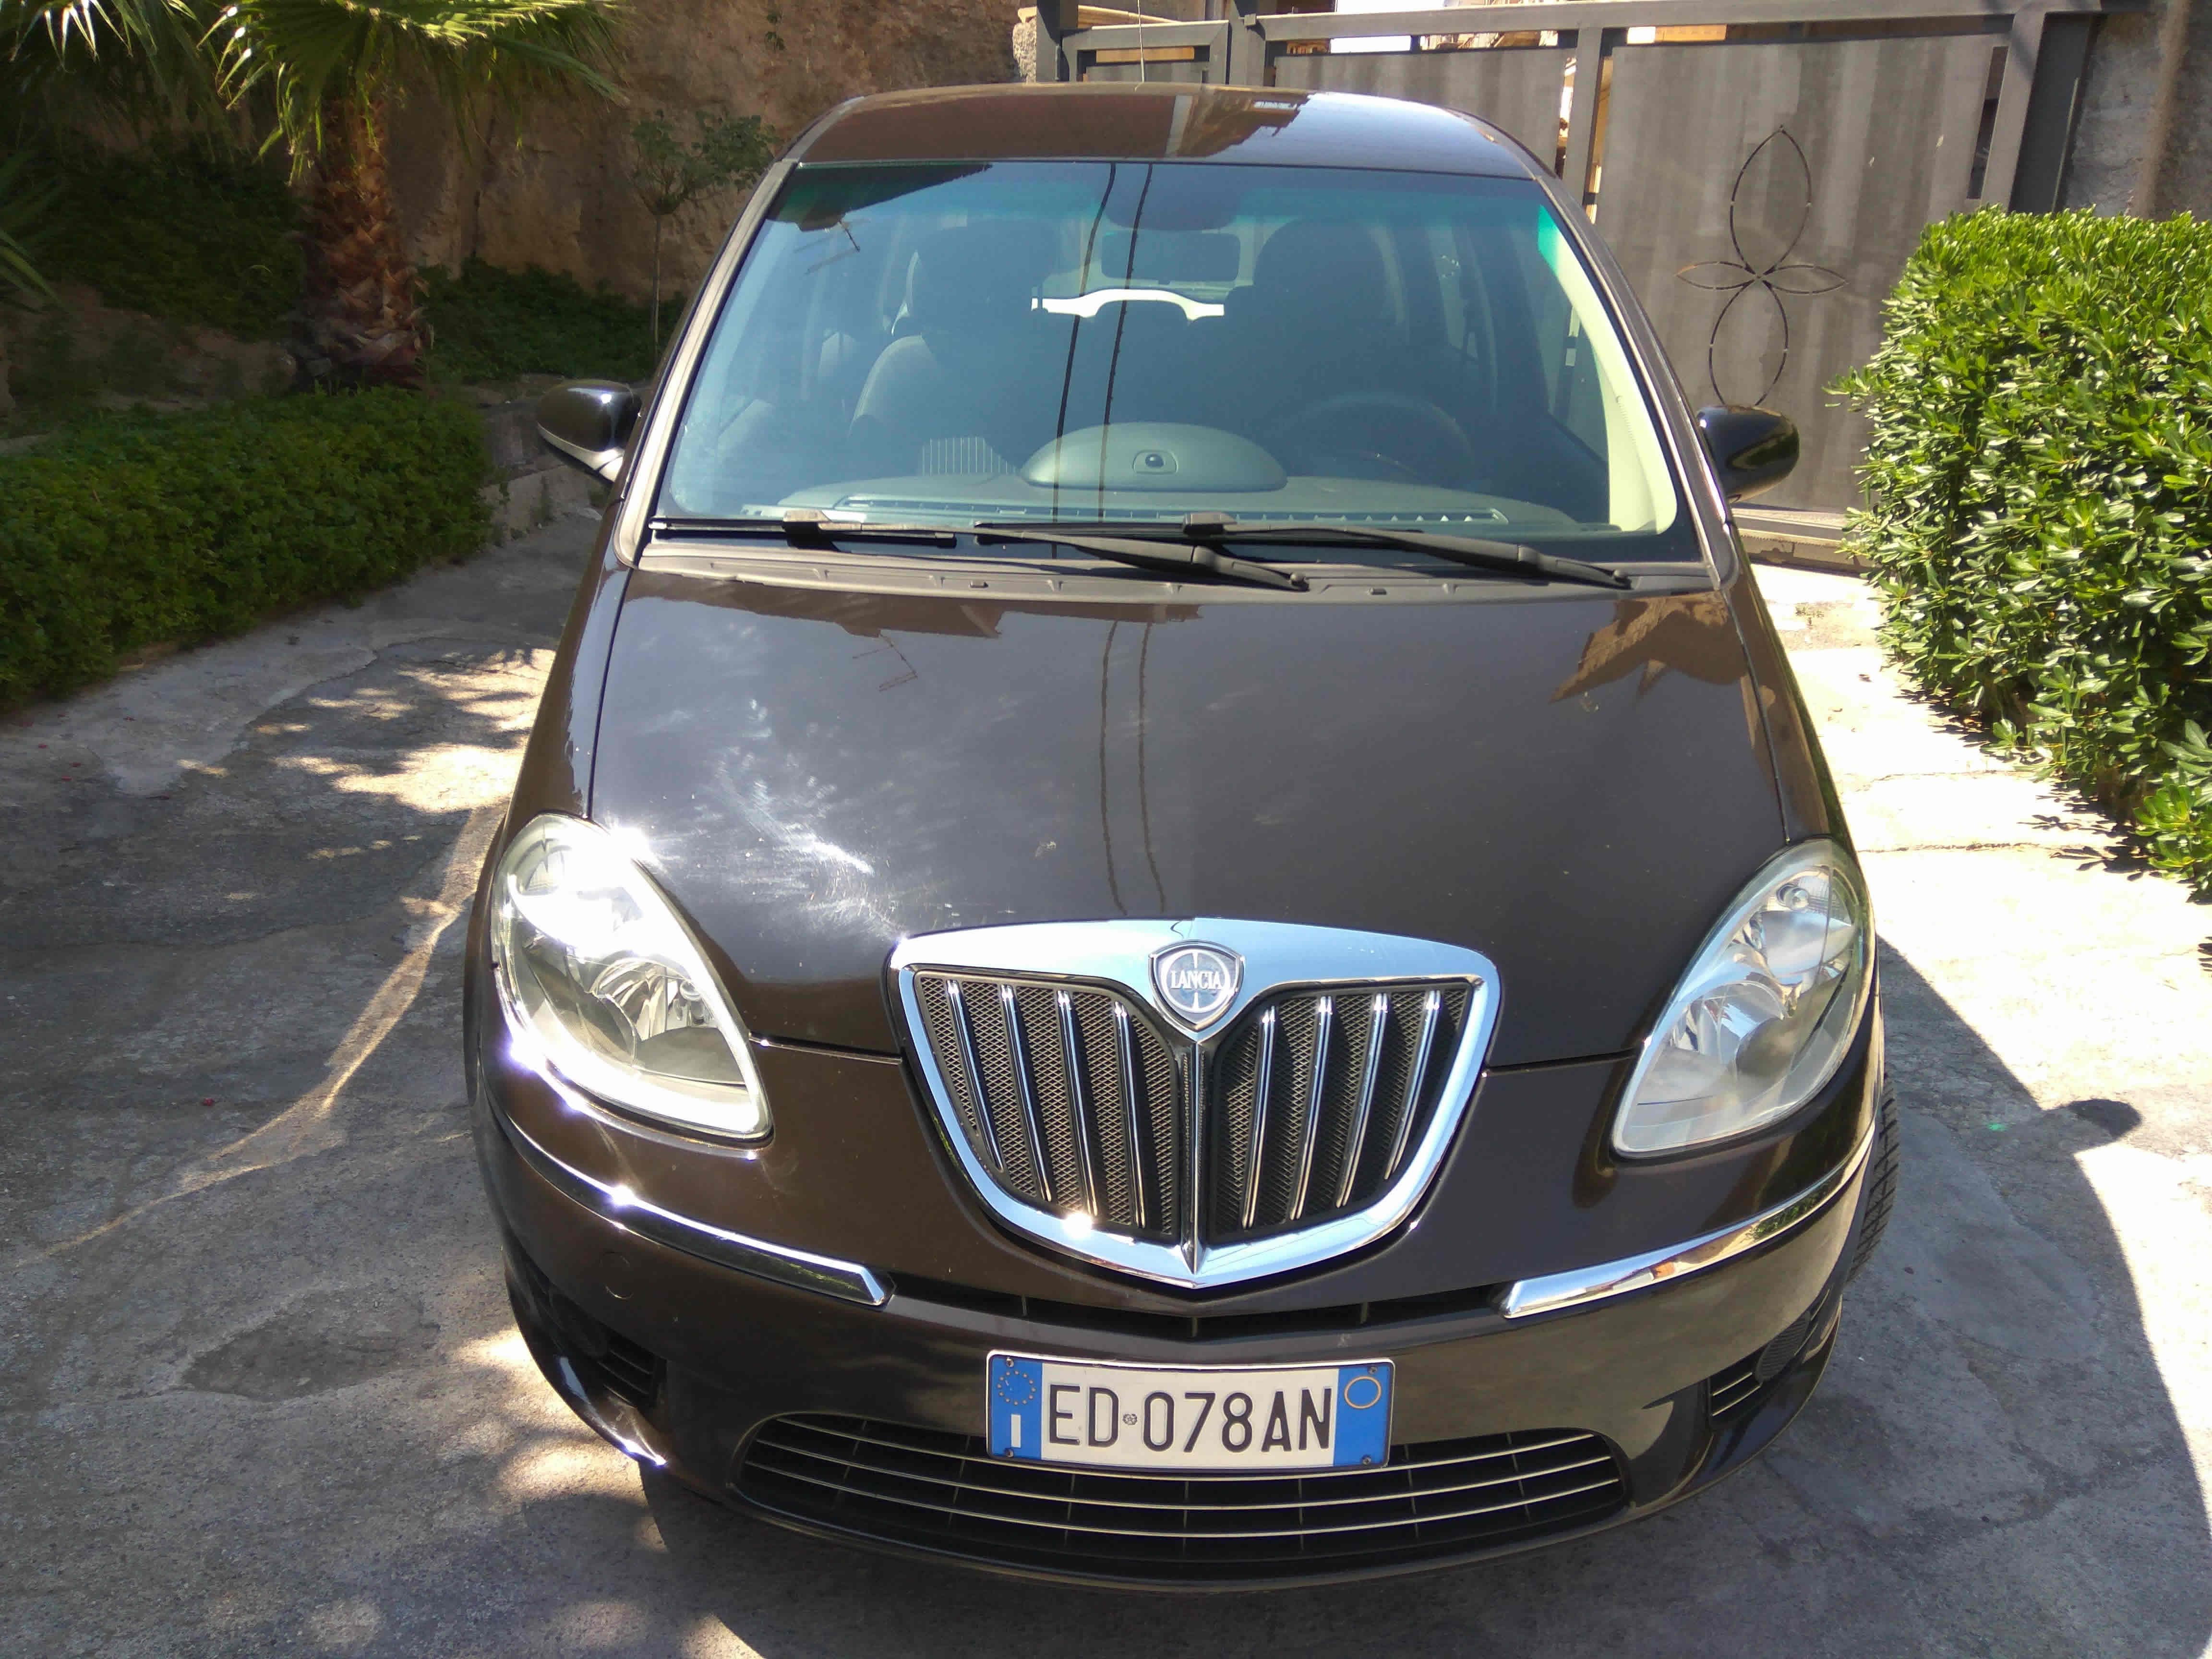 LANCIA MUSA 1.6 MJT 120CV - €5.500